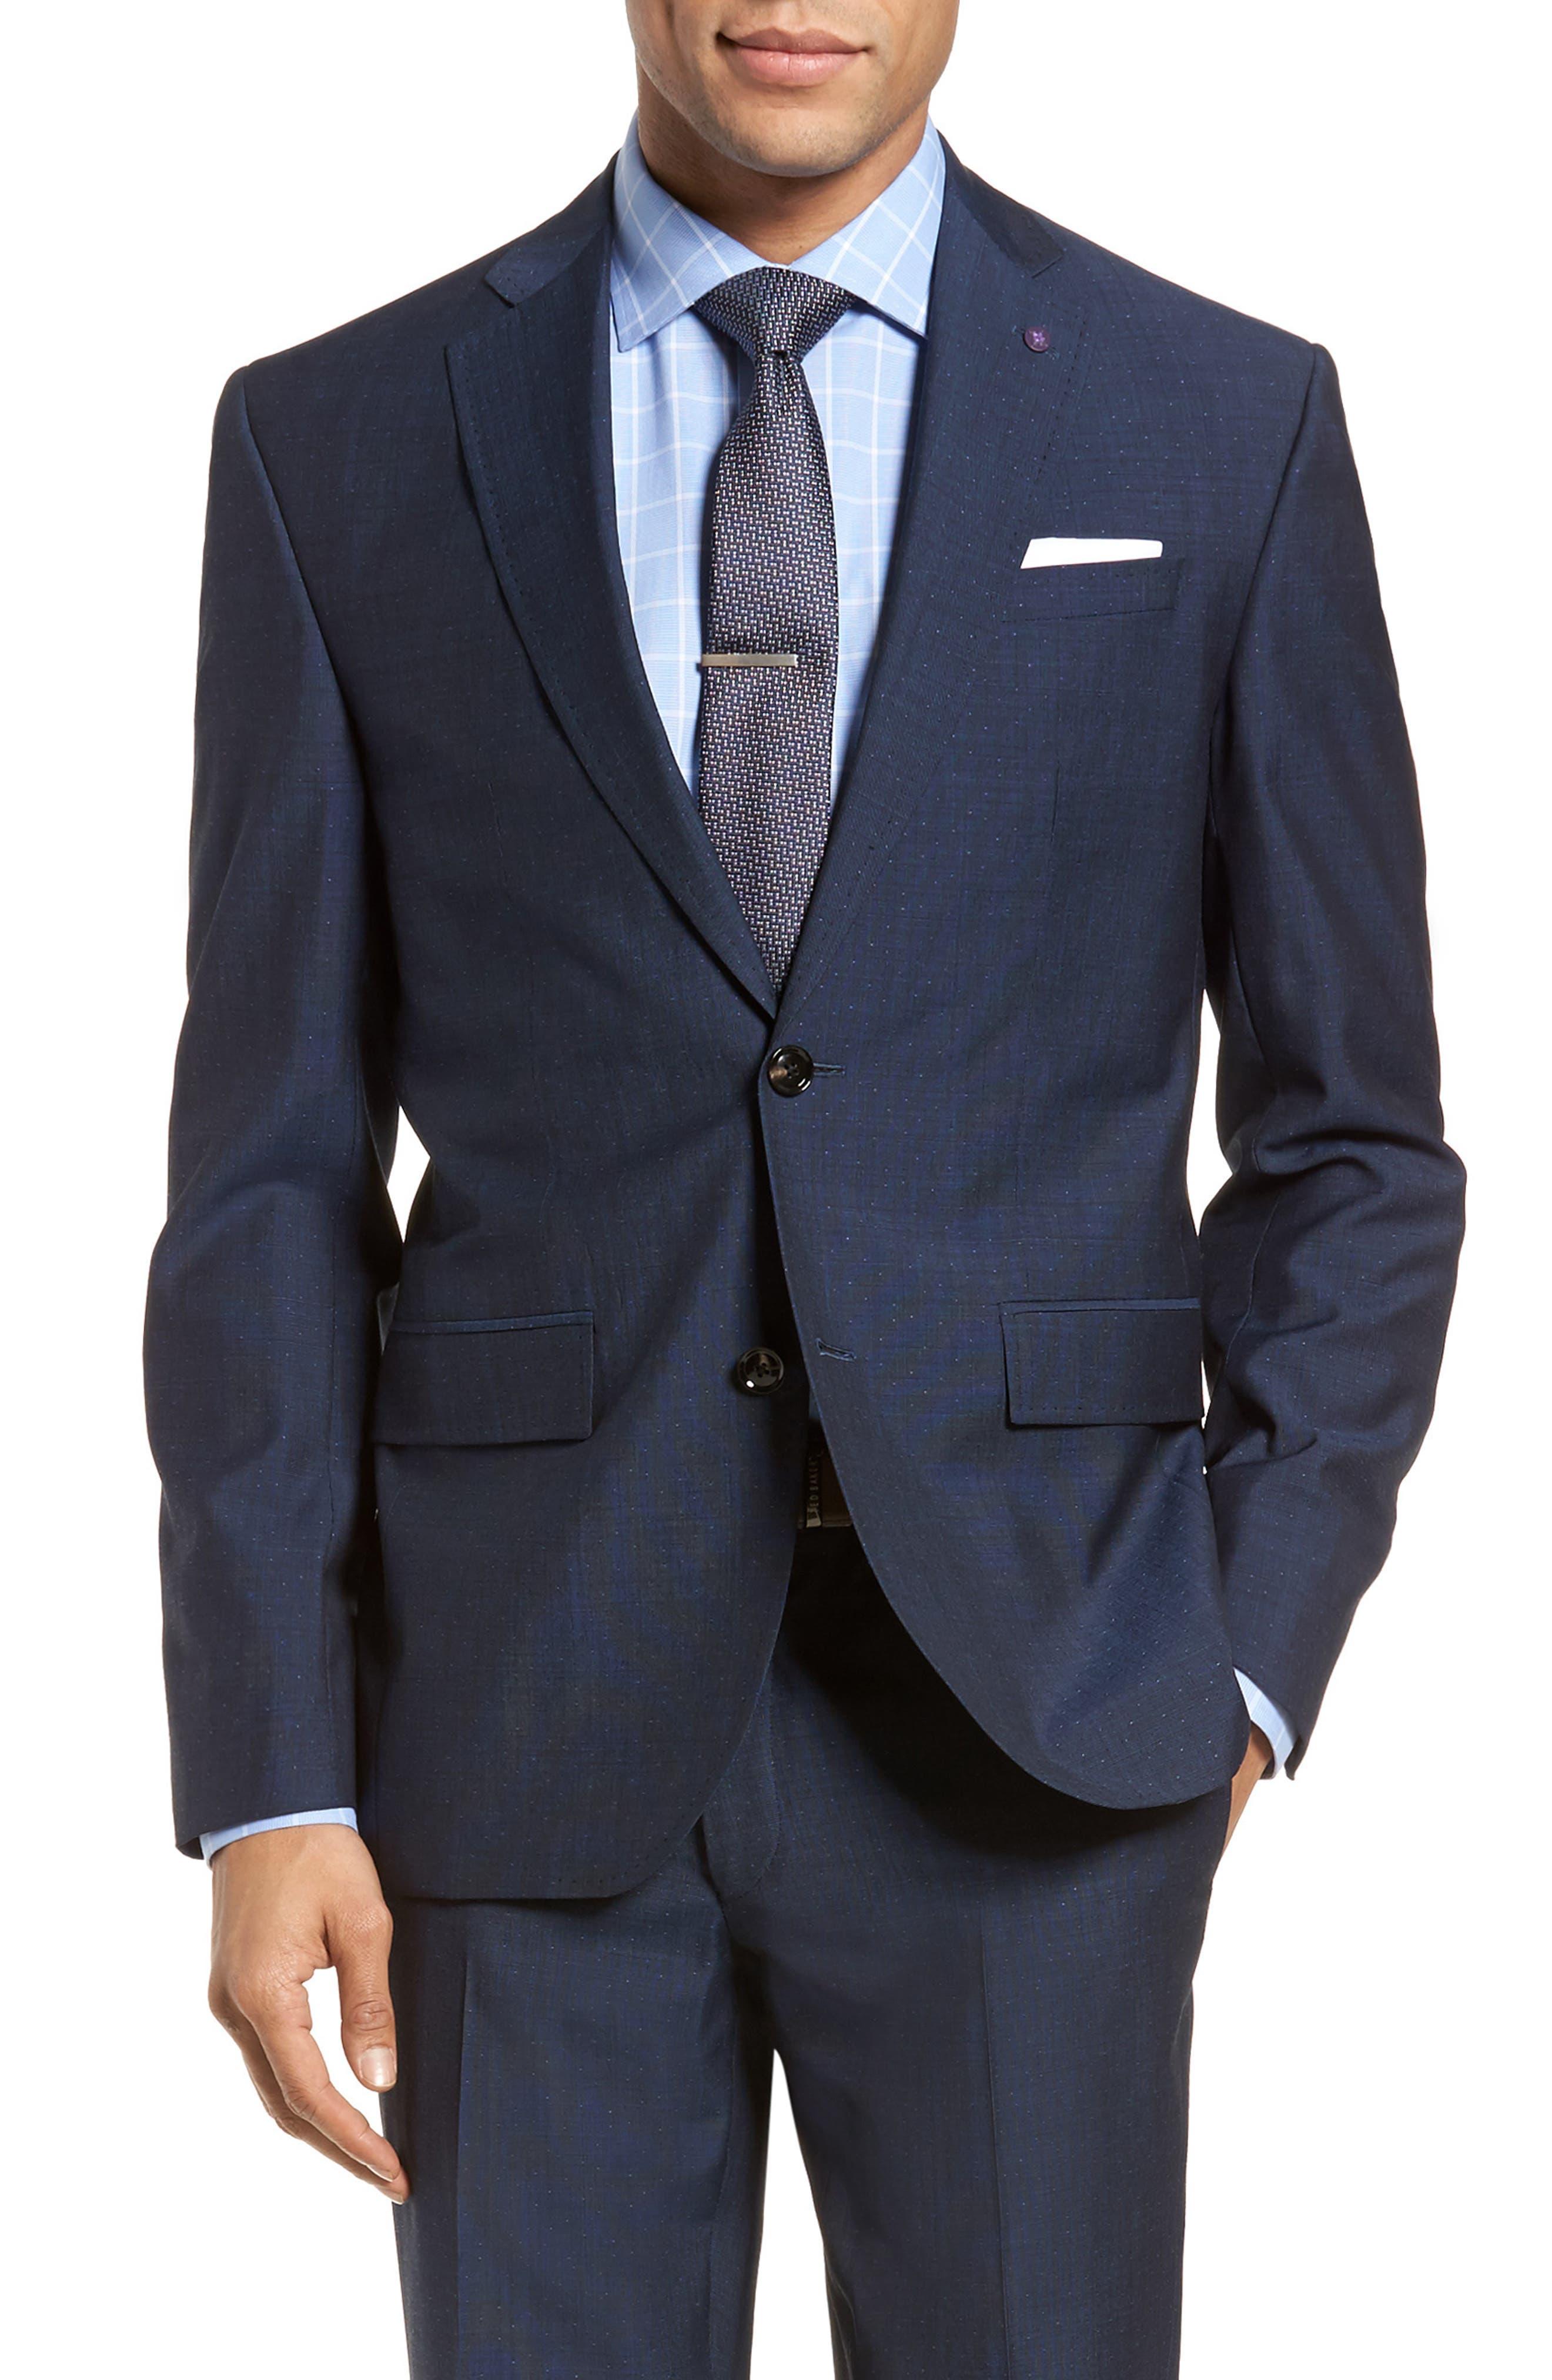 Roger Extra Slim Fit Dot Wool Suit,                             Alternate thumbnail 6, color,                             Dark Blue